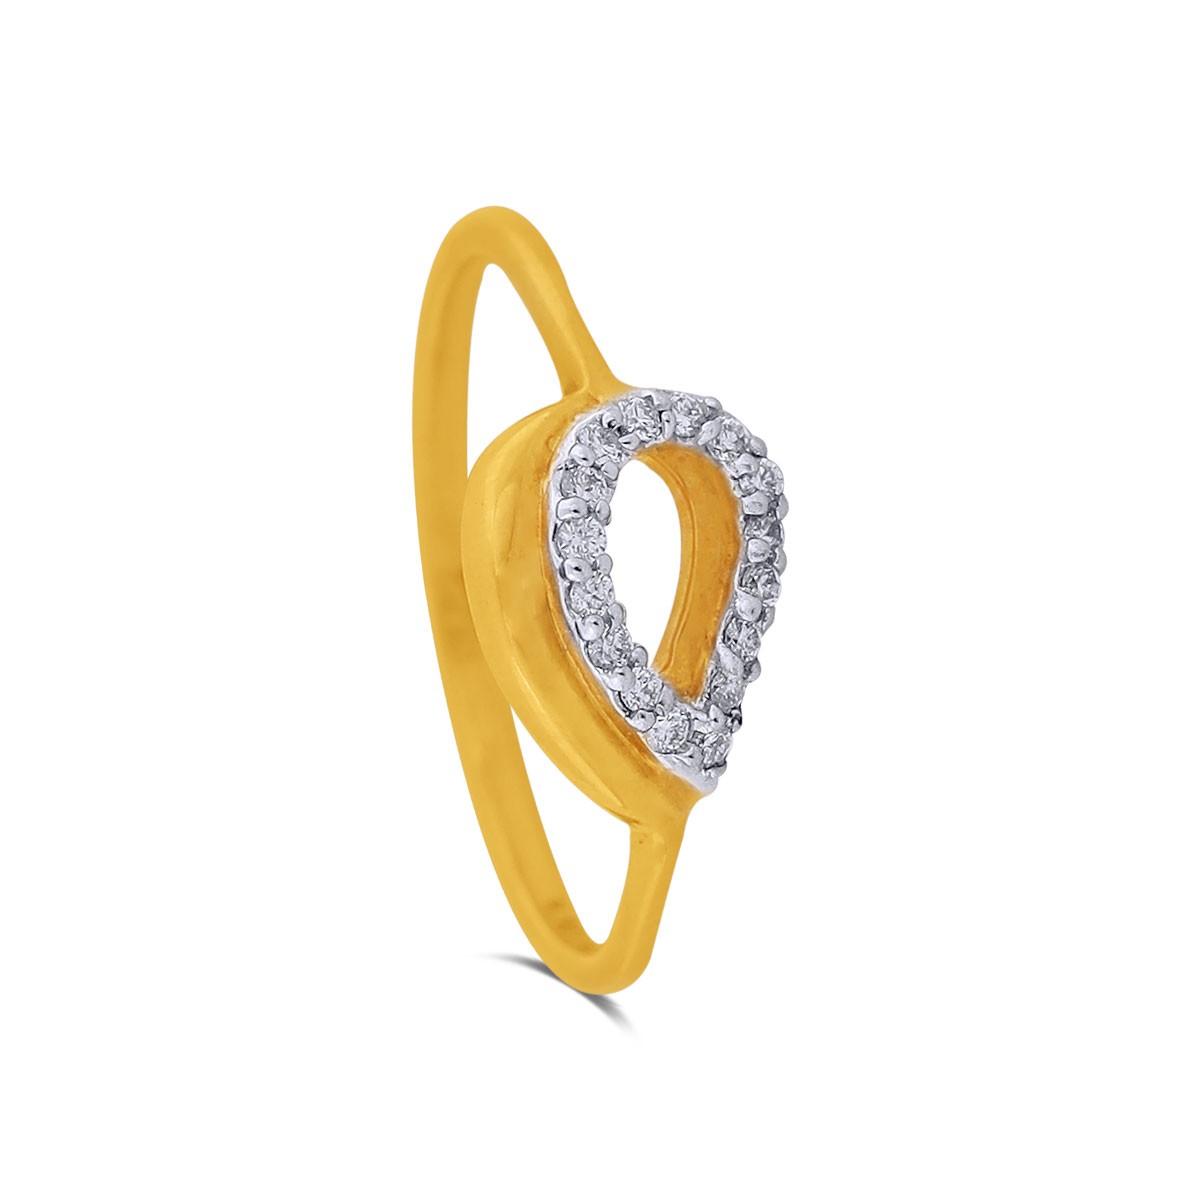 Thesally Yellow Gold Diamond Ring